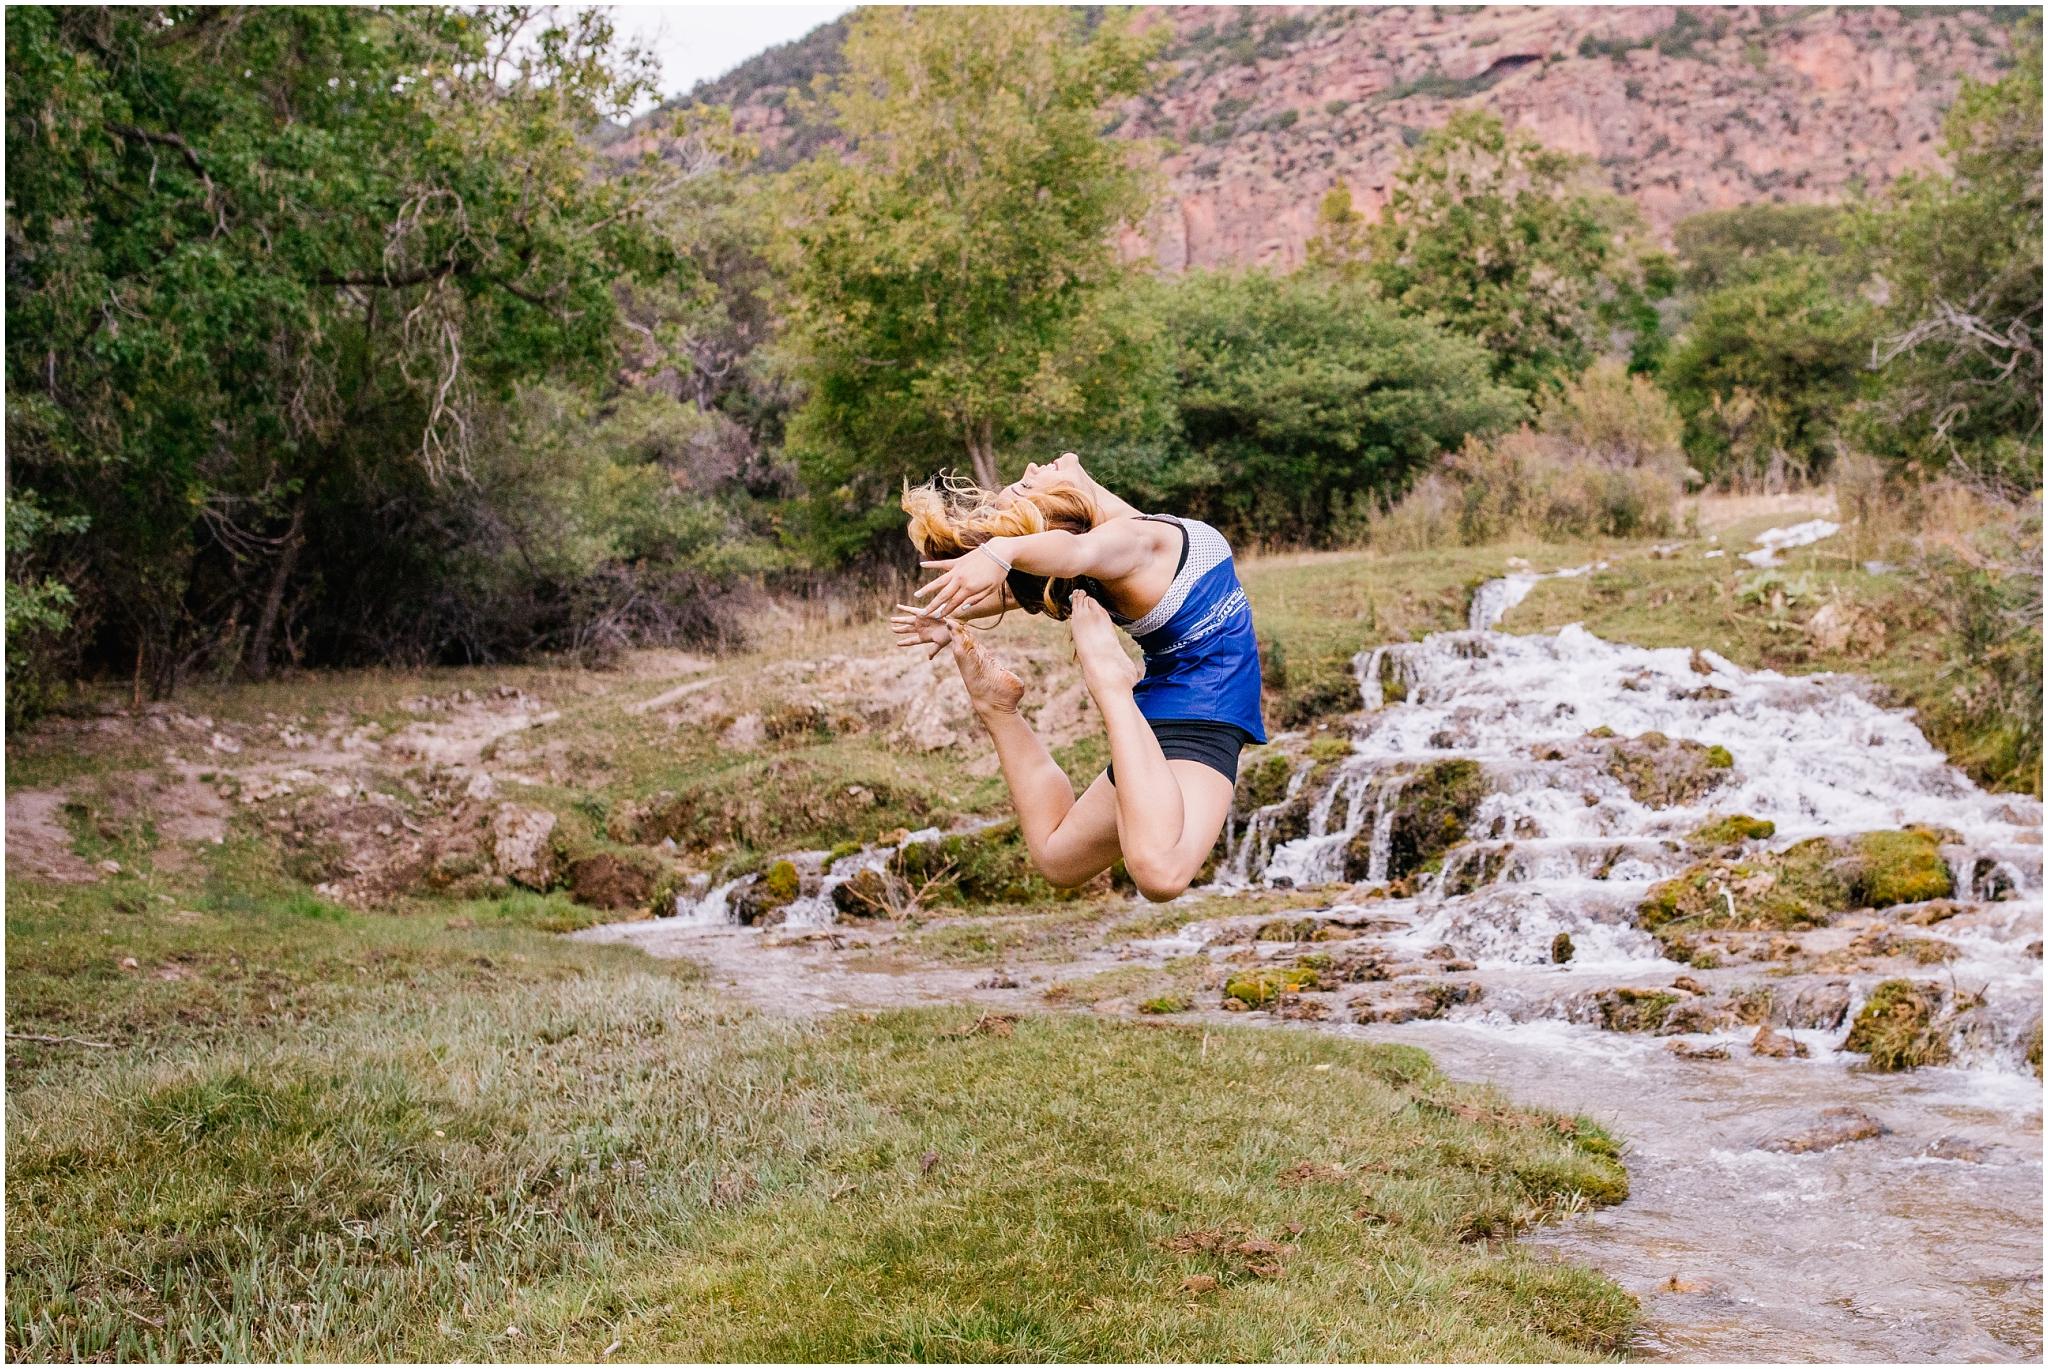 GVHSDRILL-58_Lizzie-B-Imagery-Utah-Family-Photographer-Central-Utah-Park-City-Salt-Lake-City-Drill-Team-Photography-Dance.jpg